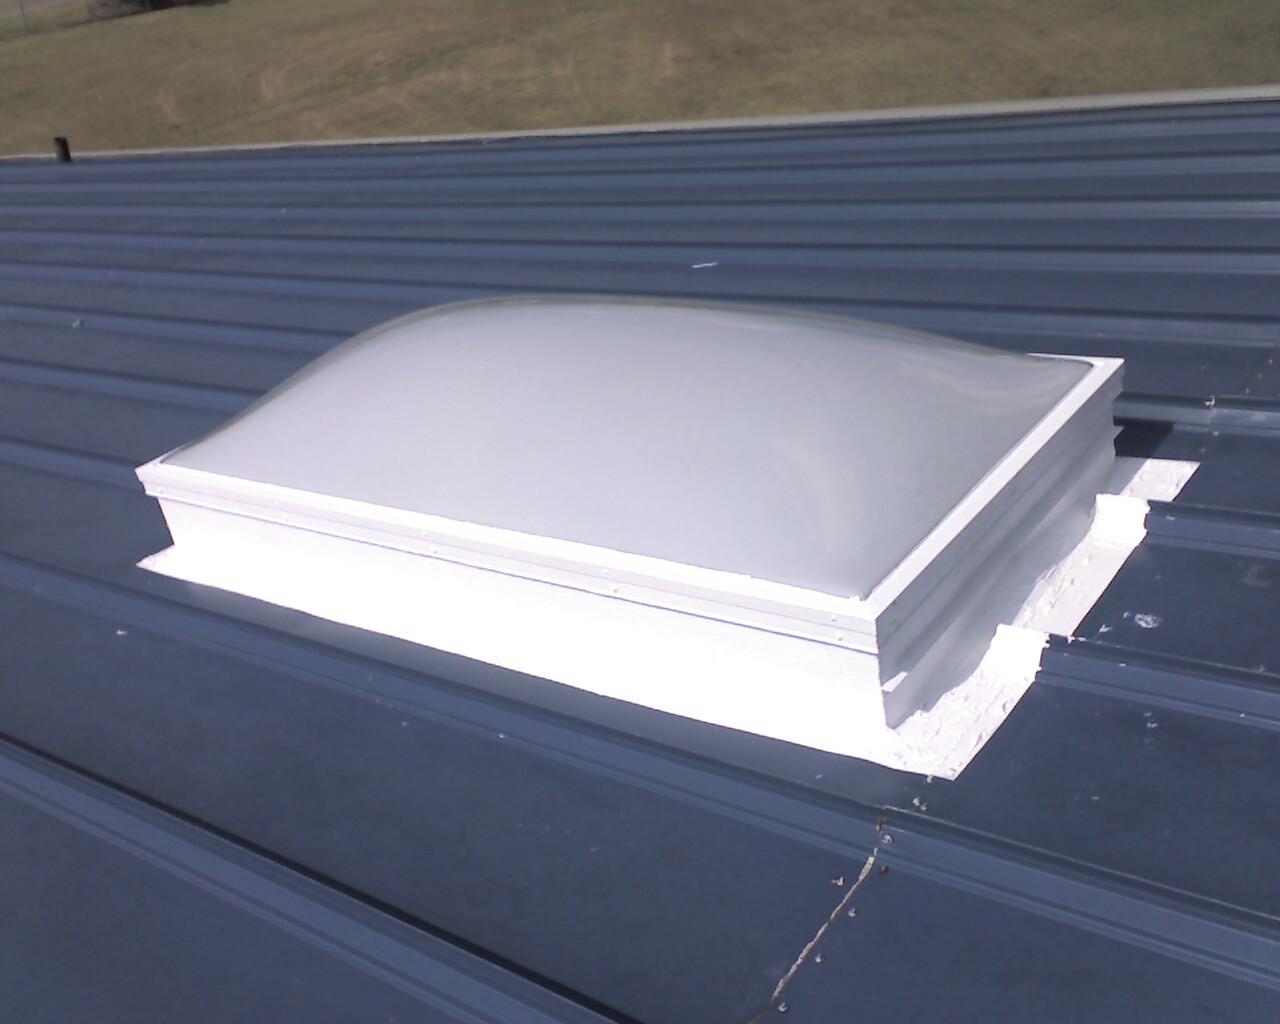 Airport hangar skylight repair - airport facilities maintenance